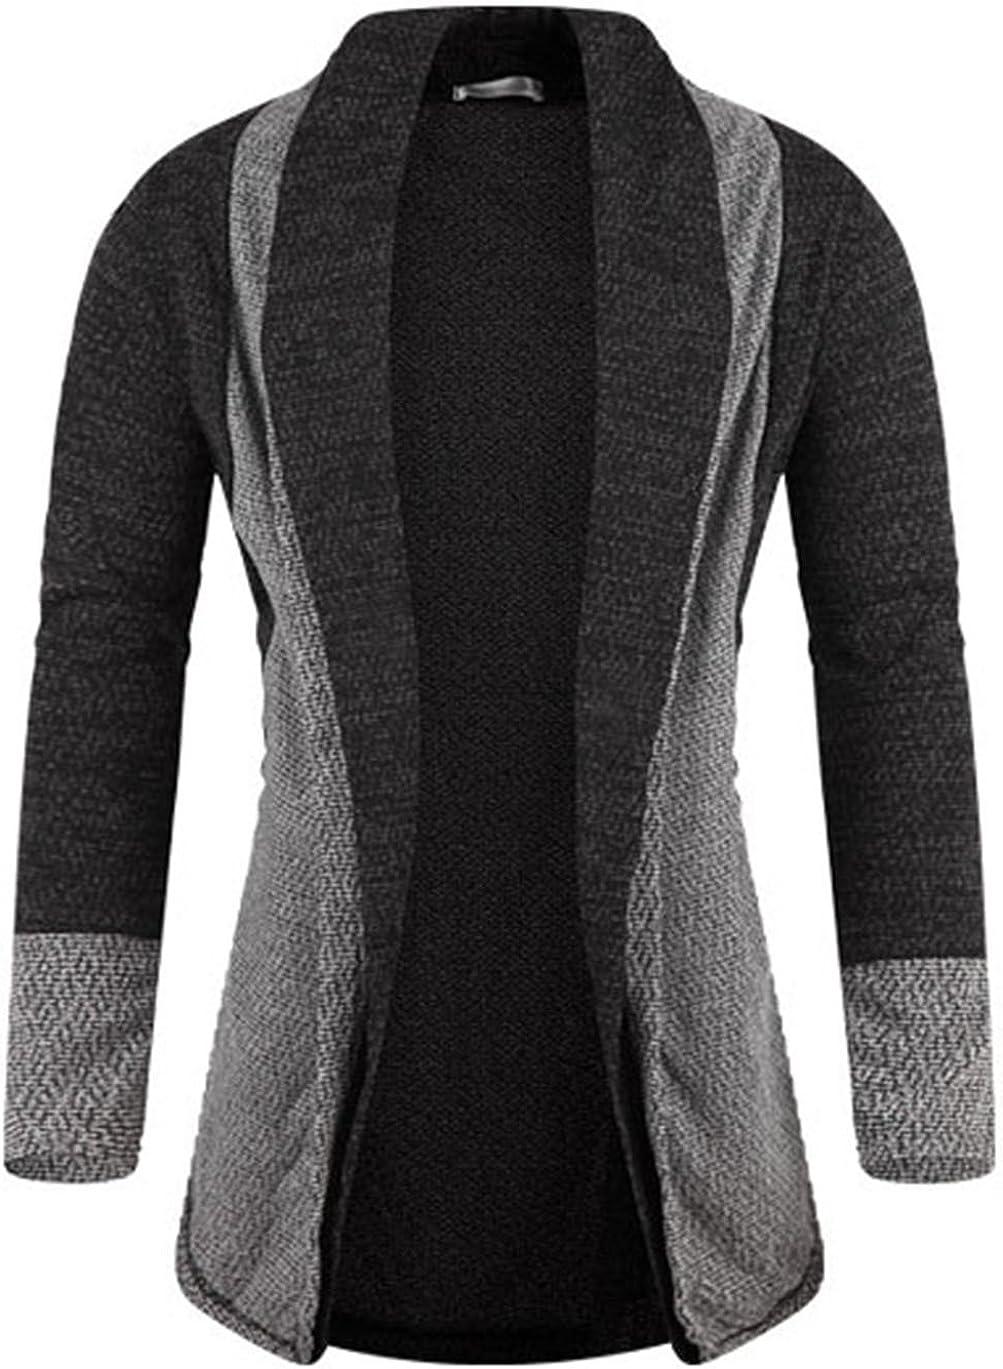 Men's Luxury Coloration Shawl Knit Cardigan Sweater Jumper Top